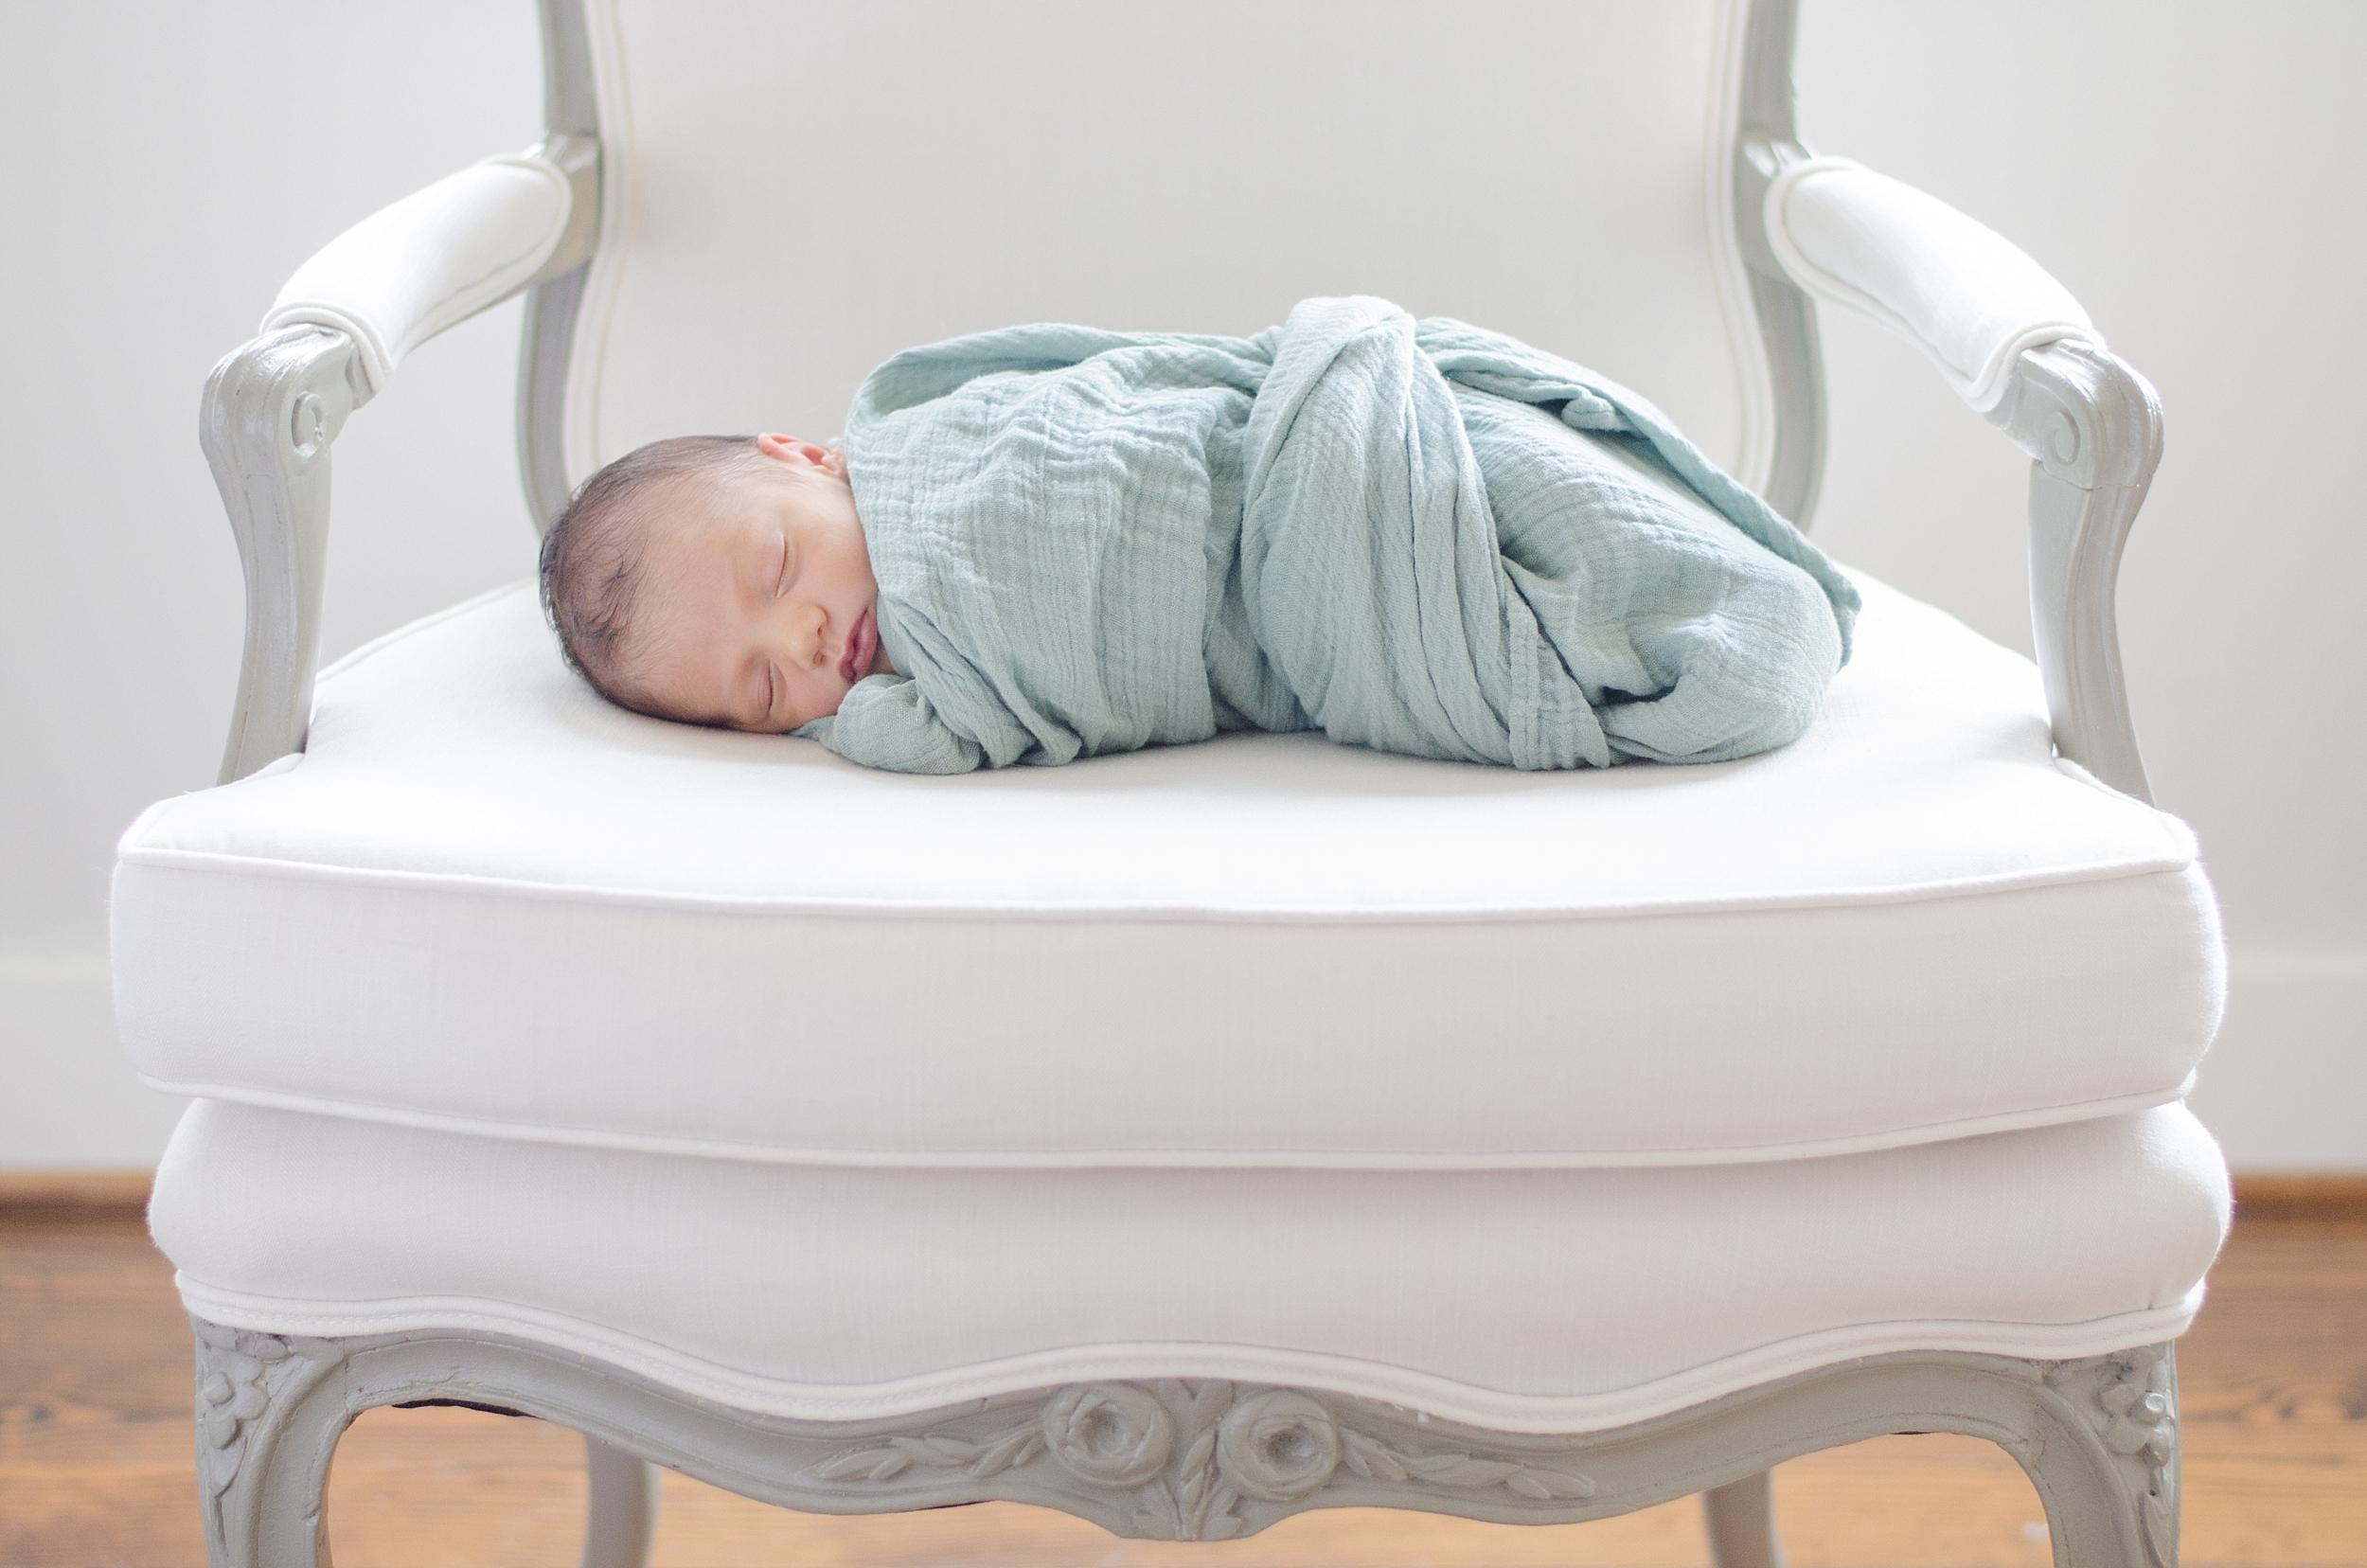 Landon-Schneider-Photography-Newborn-Session-Houston-Texas_0150.jpg